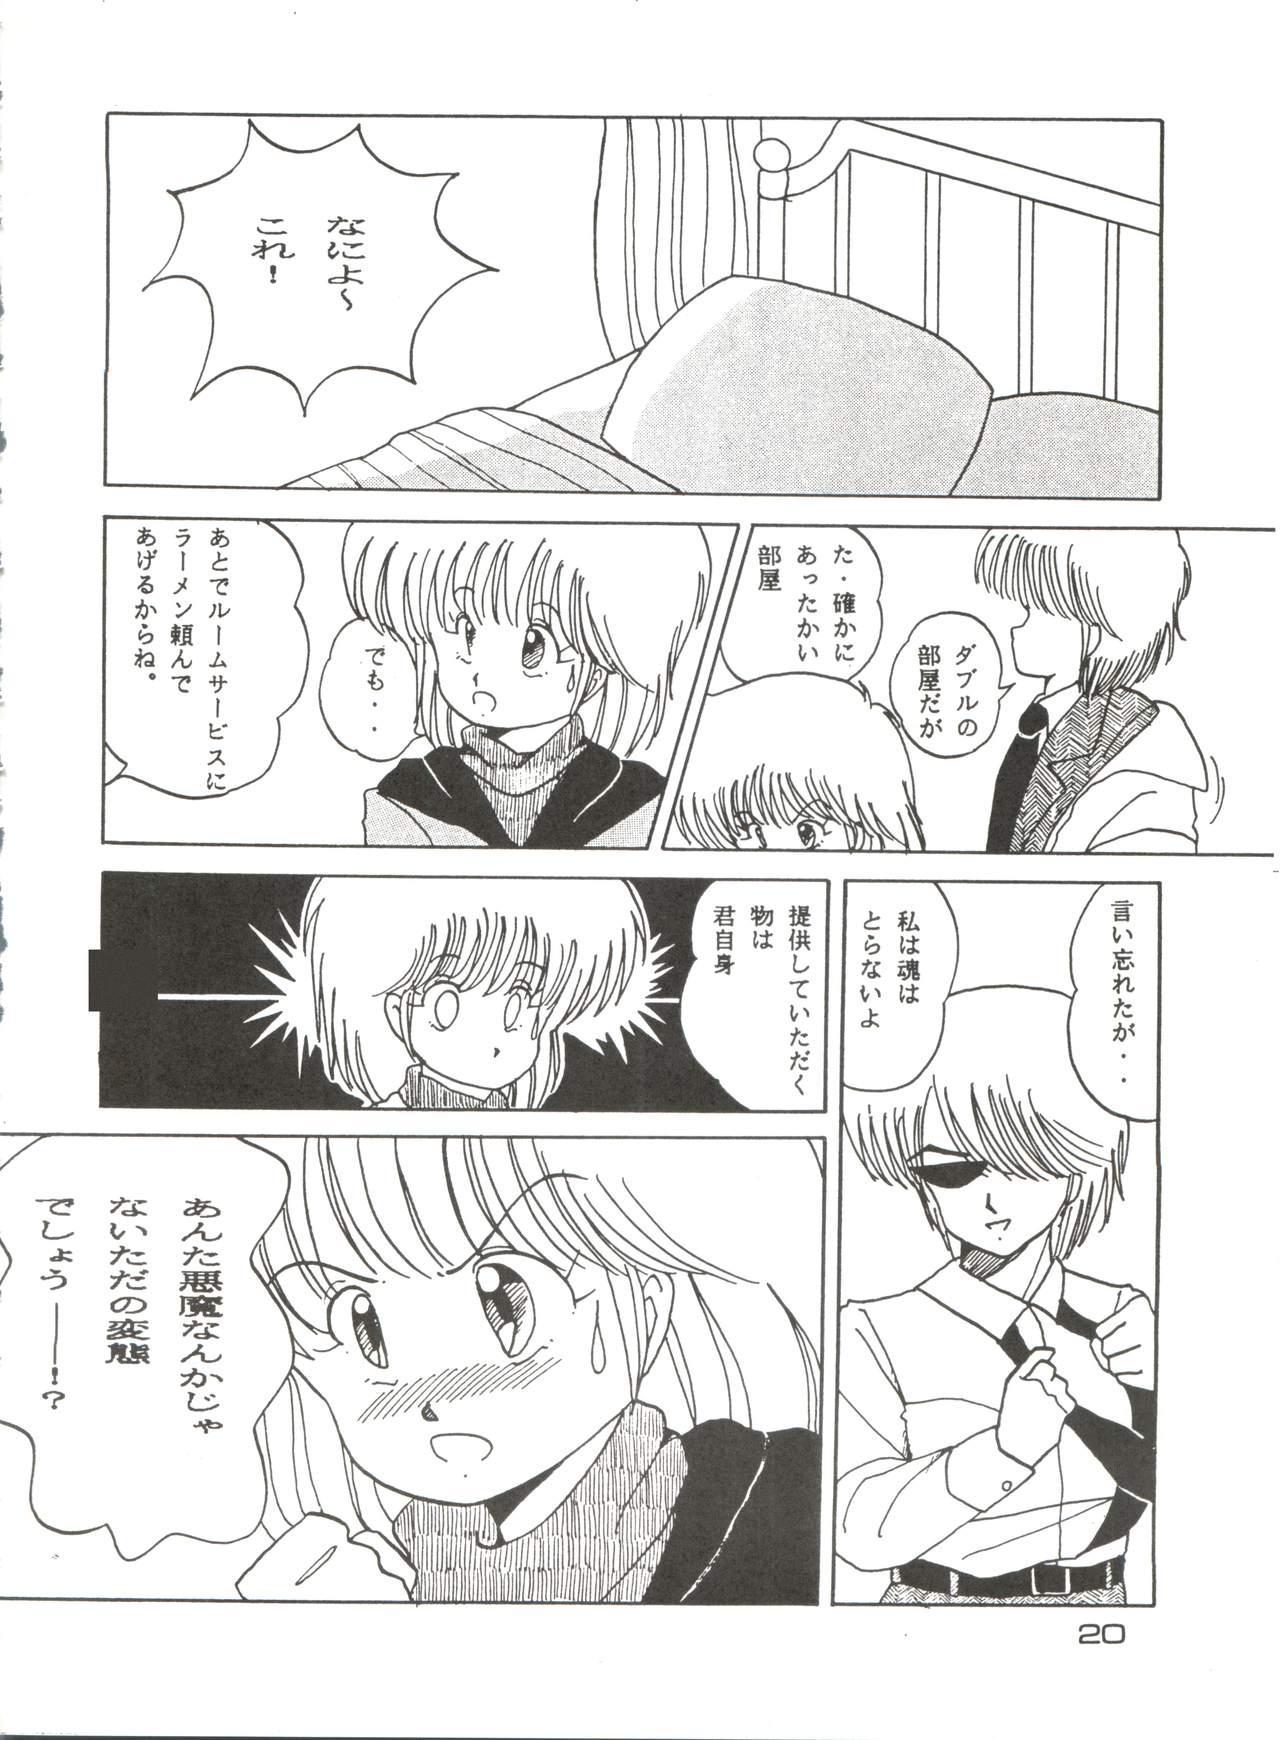 [Studio Fuck (Various) Onapet 7 (Sonic Soldier Borgman, Gundam ZZ, Osomatsu-kun) 19